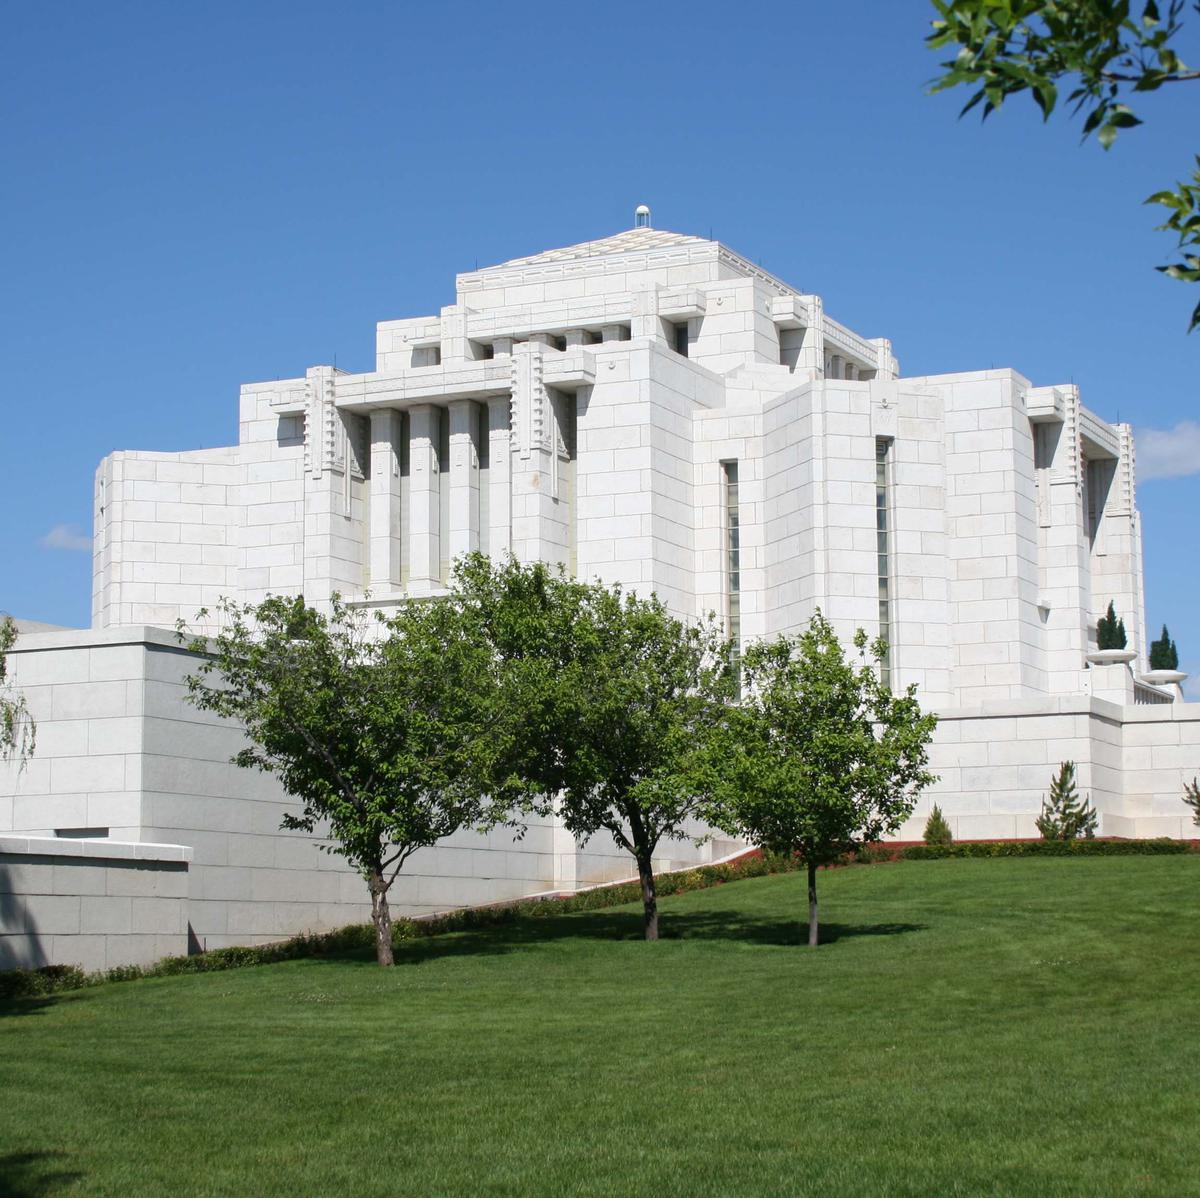 Image of the Cardston Alberta Mormon Temple